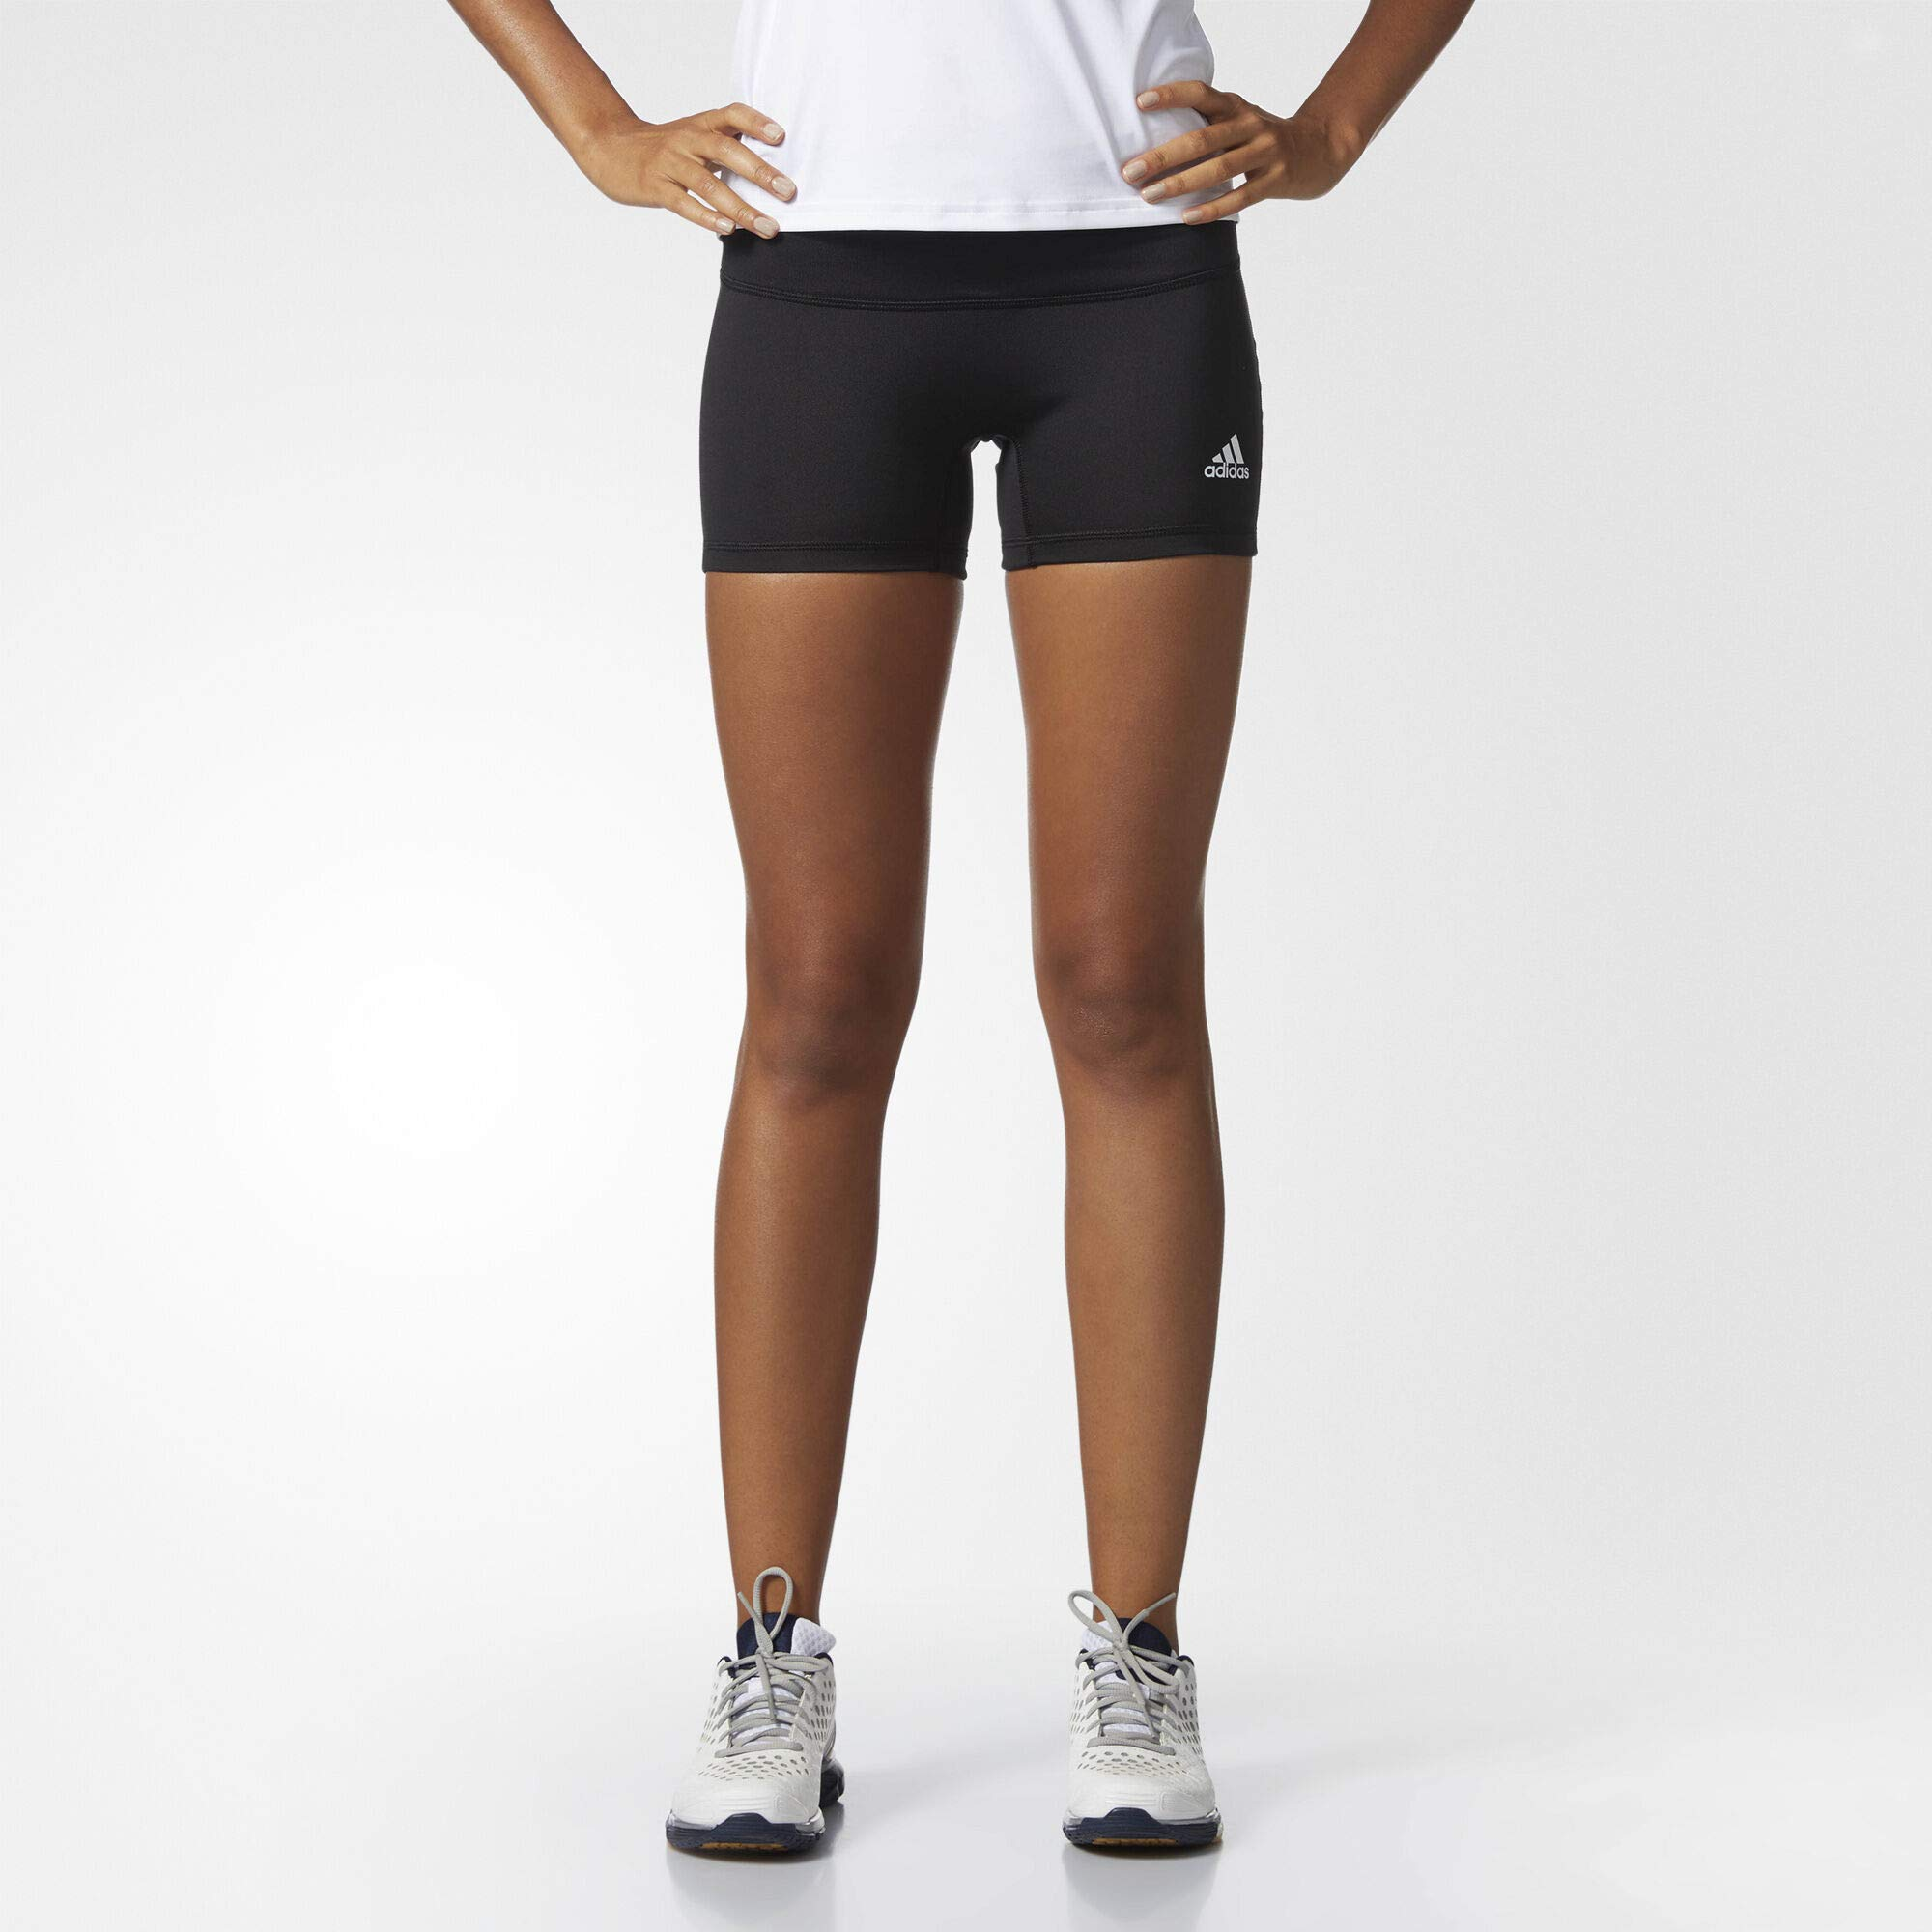 adidas Women's 4 Inch Short Tights, Black, X-Small by adidas